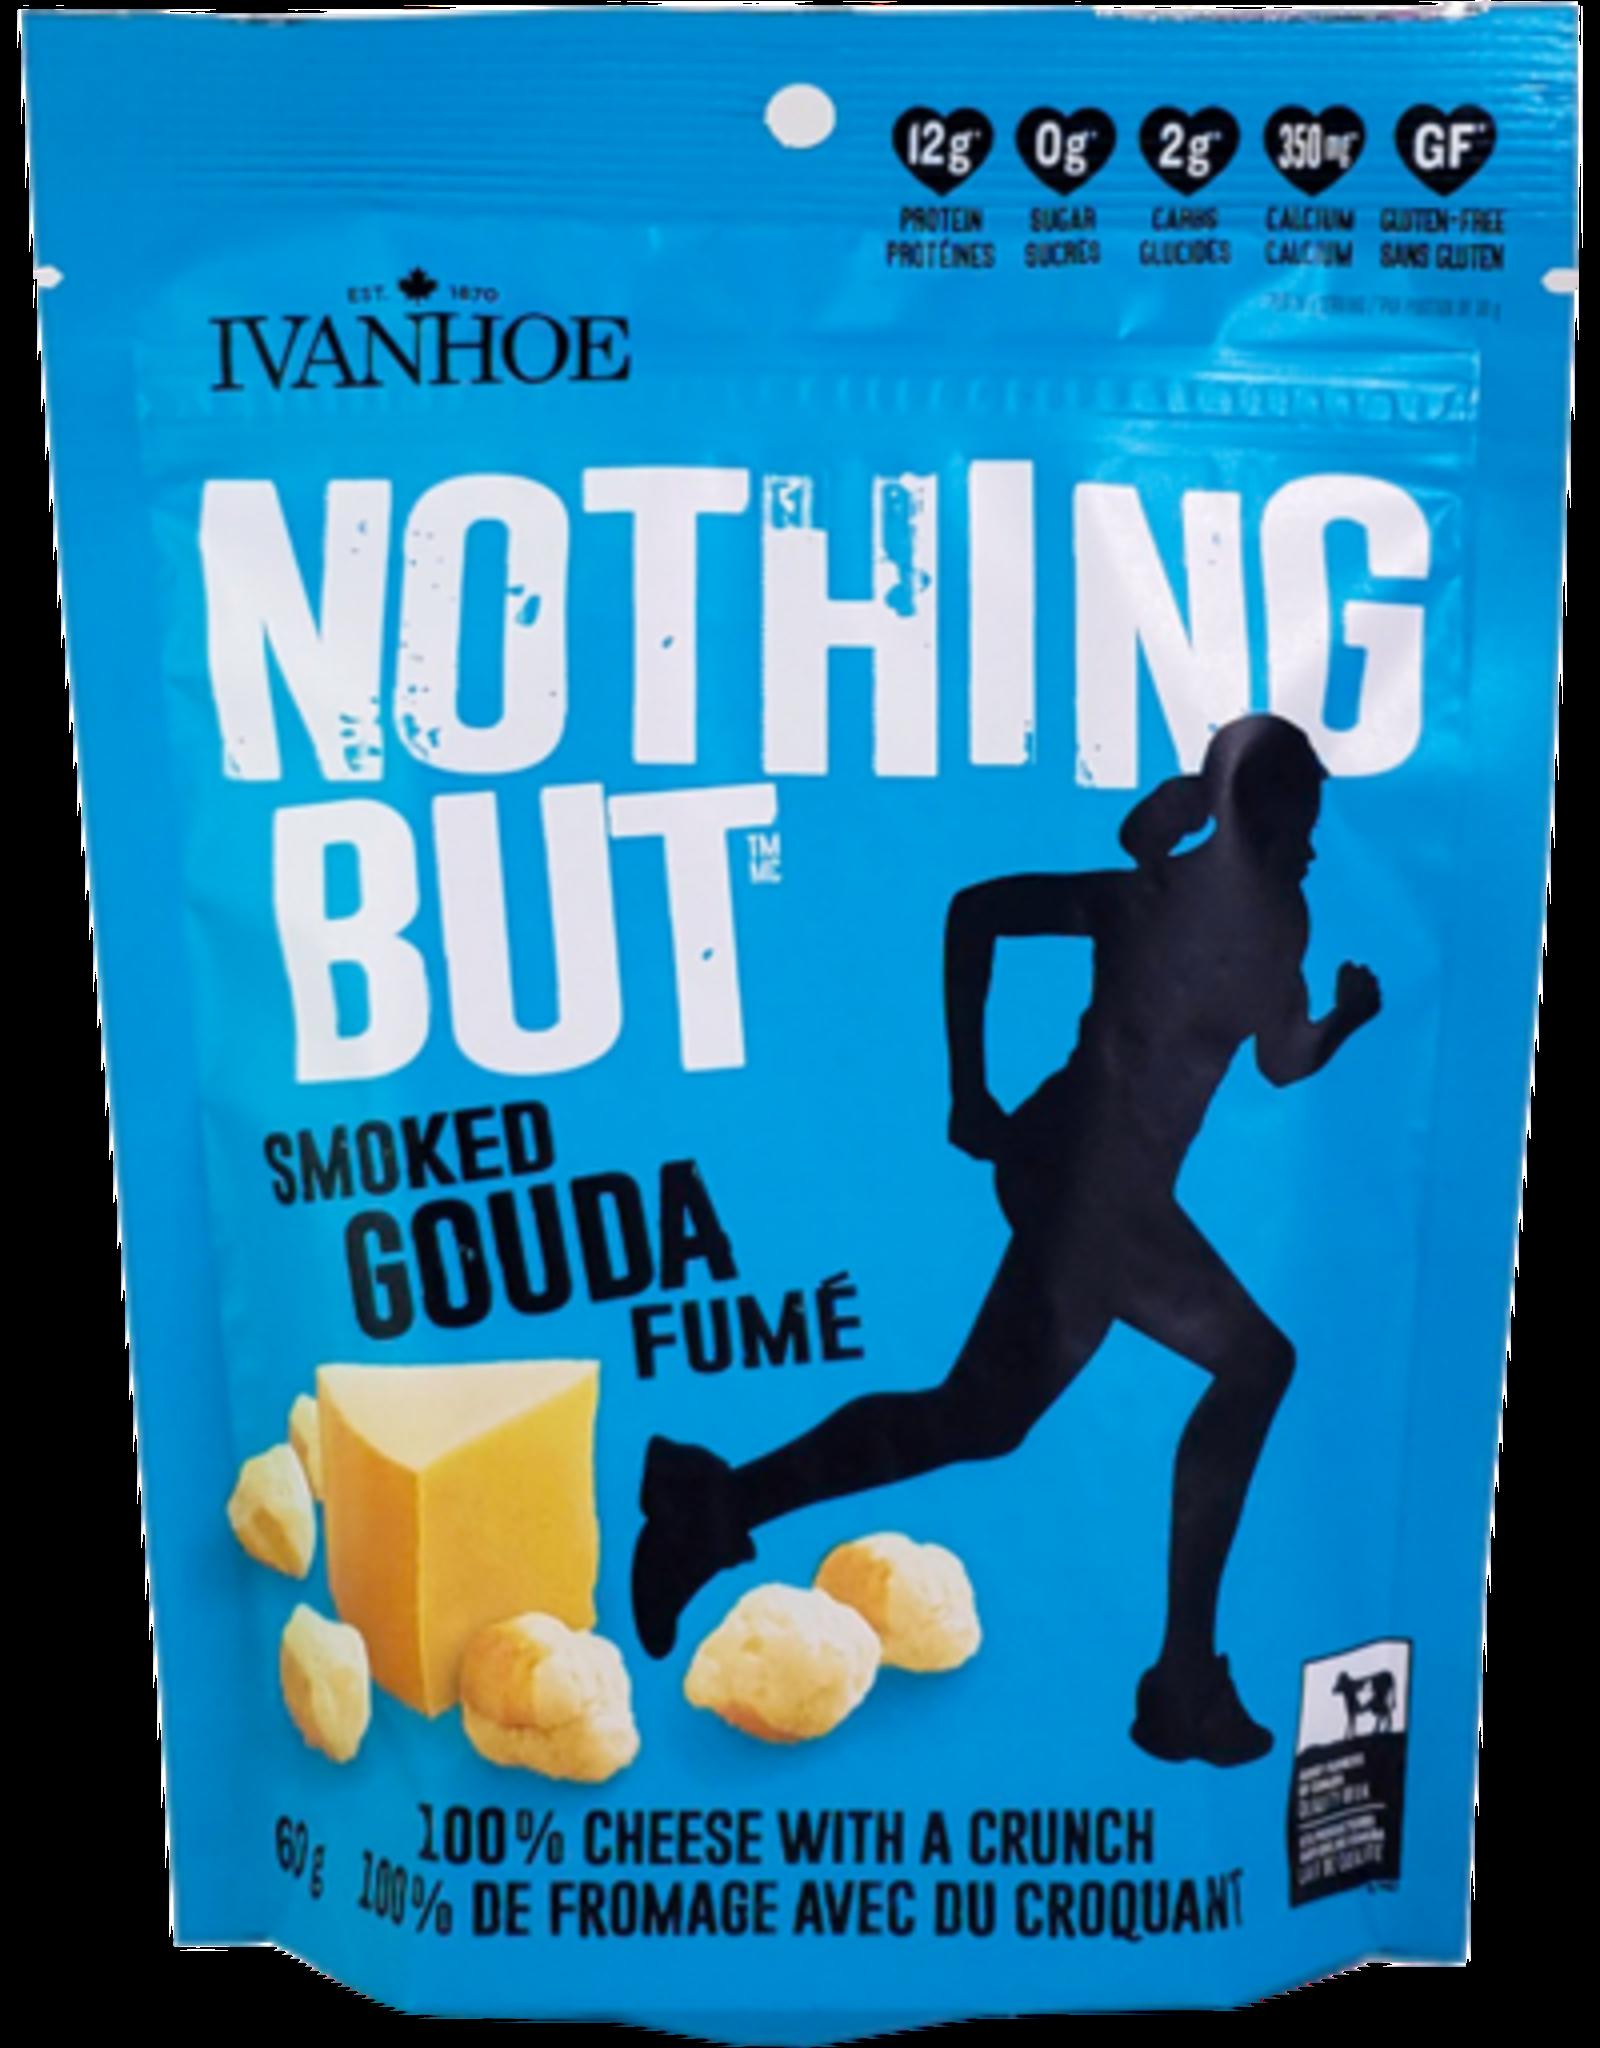 Ivanhoe Ivanhoe - Collation Croquante de Fromage, Gouda Fumé (60g)